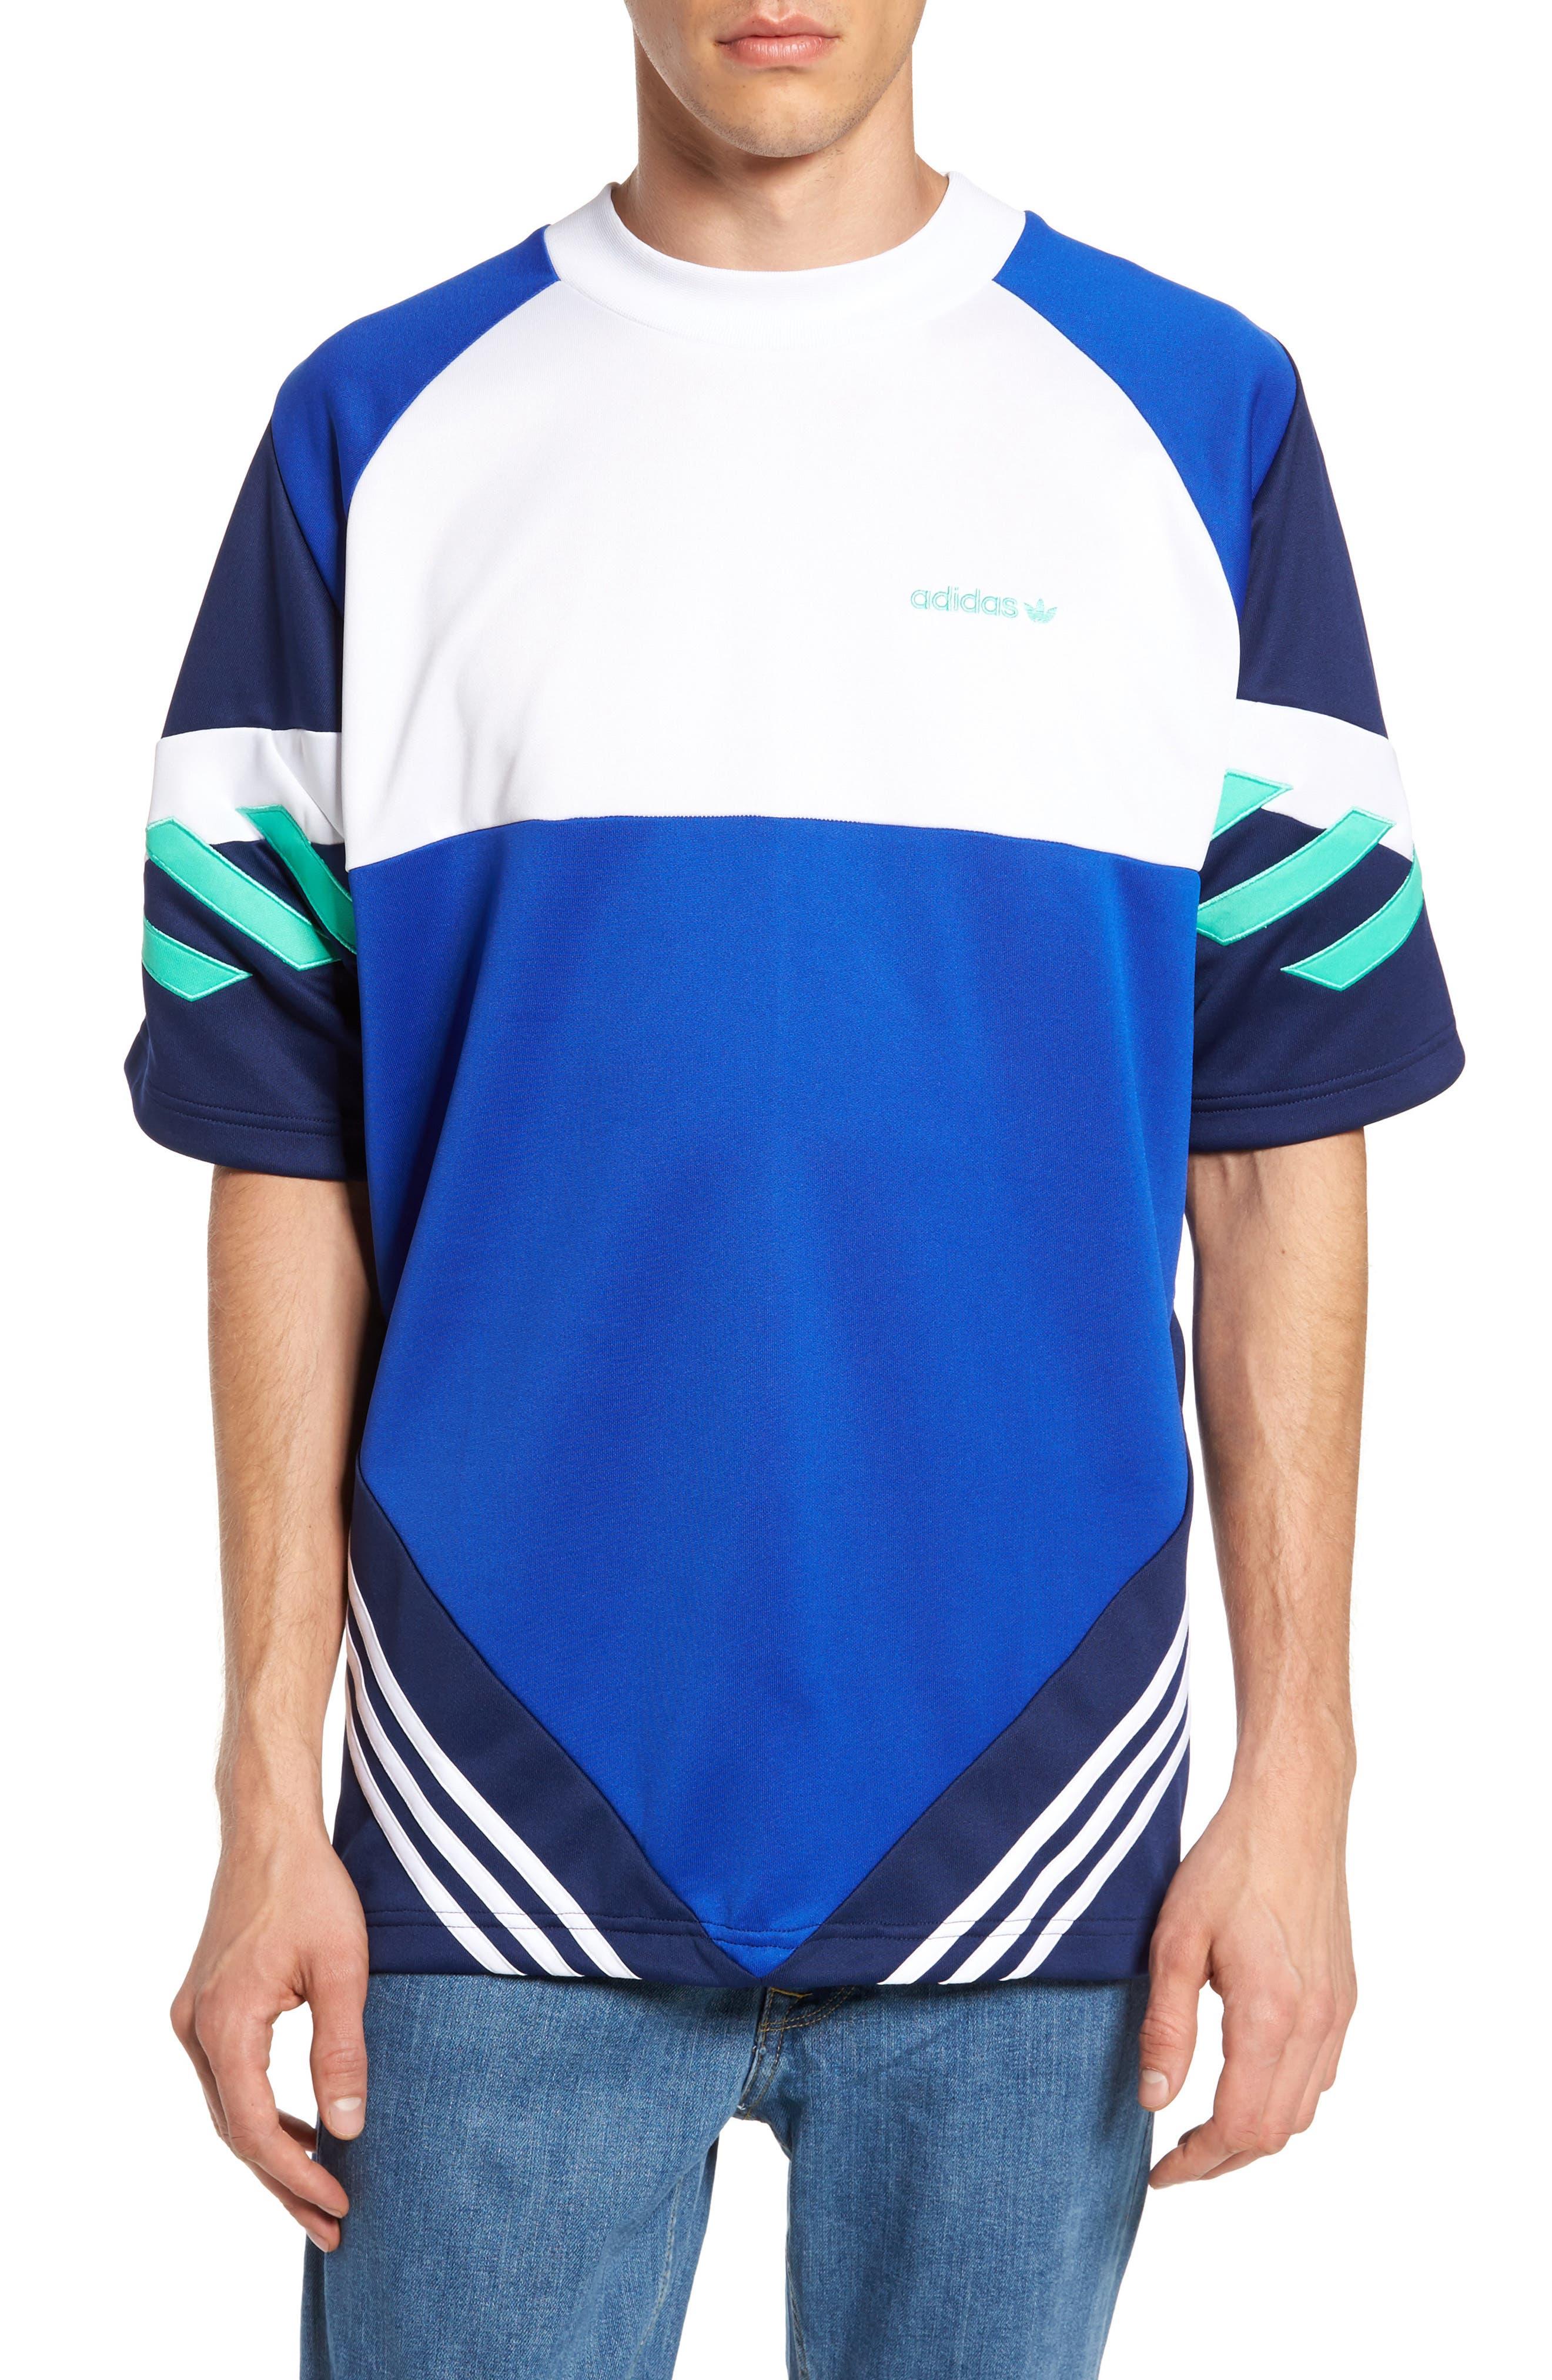 Alternate Image 1 Selected - adidas Originals Chop Shop T-Shirt